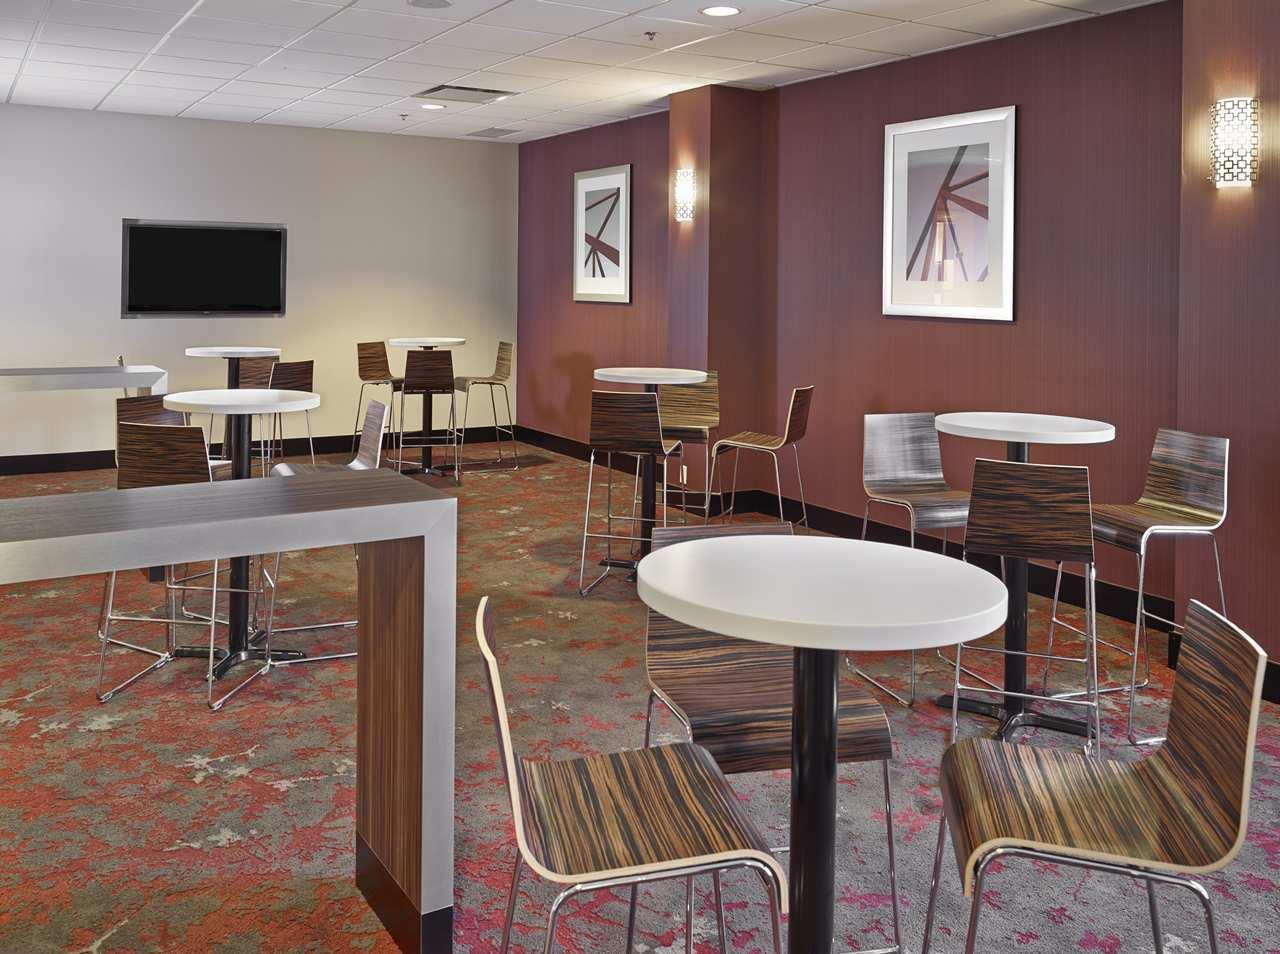 DoubleTree by Hilton Hotel West Edmonton in Edmonton: SilverBirch Connections Café